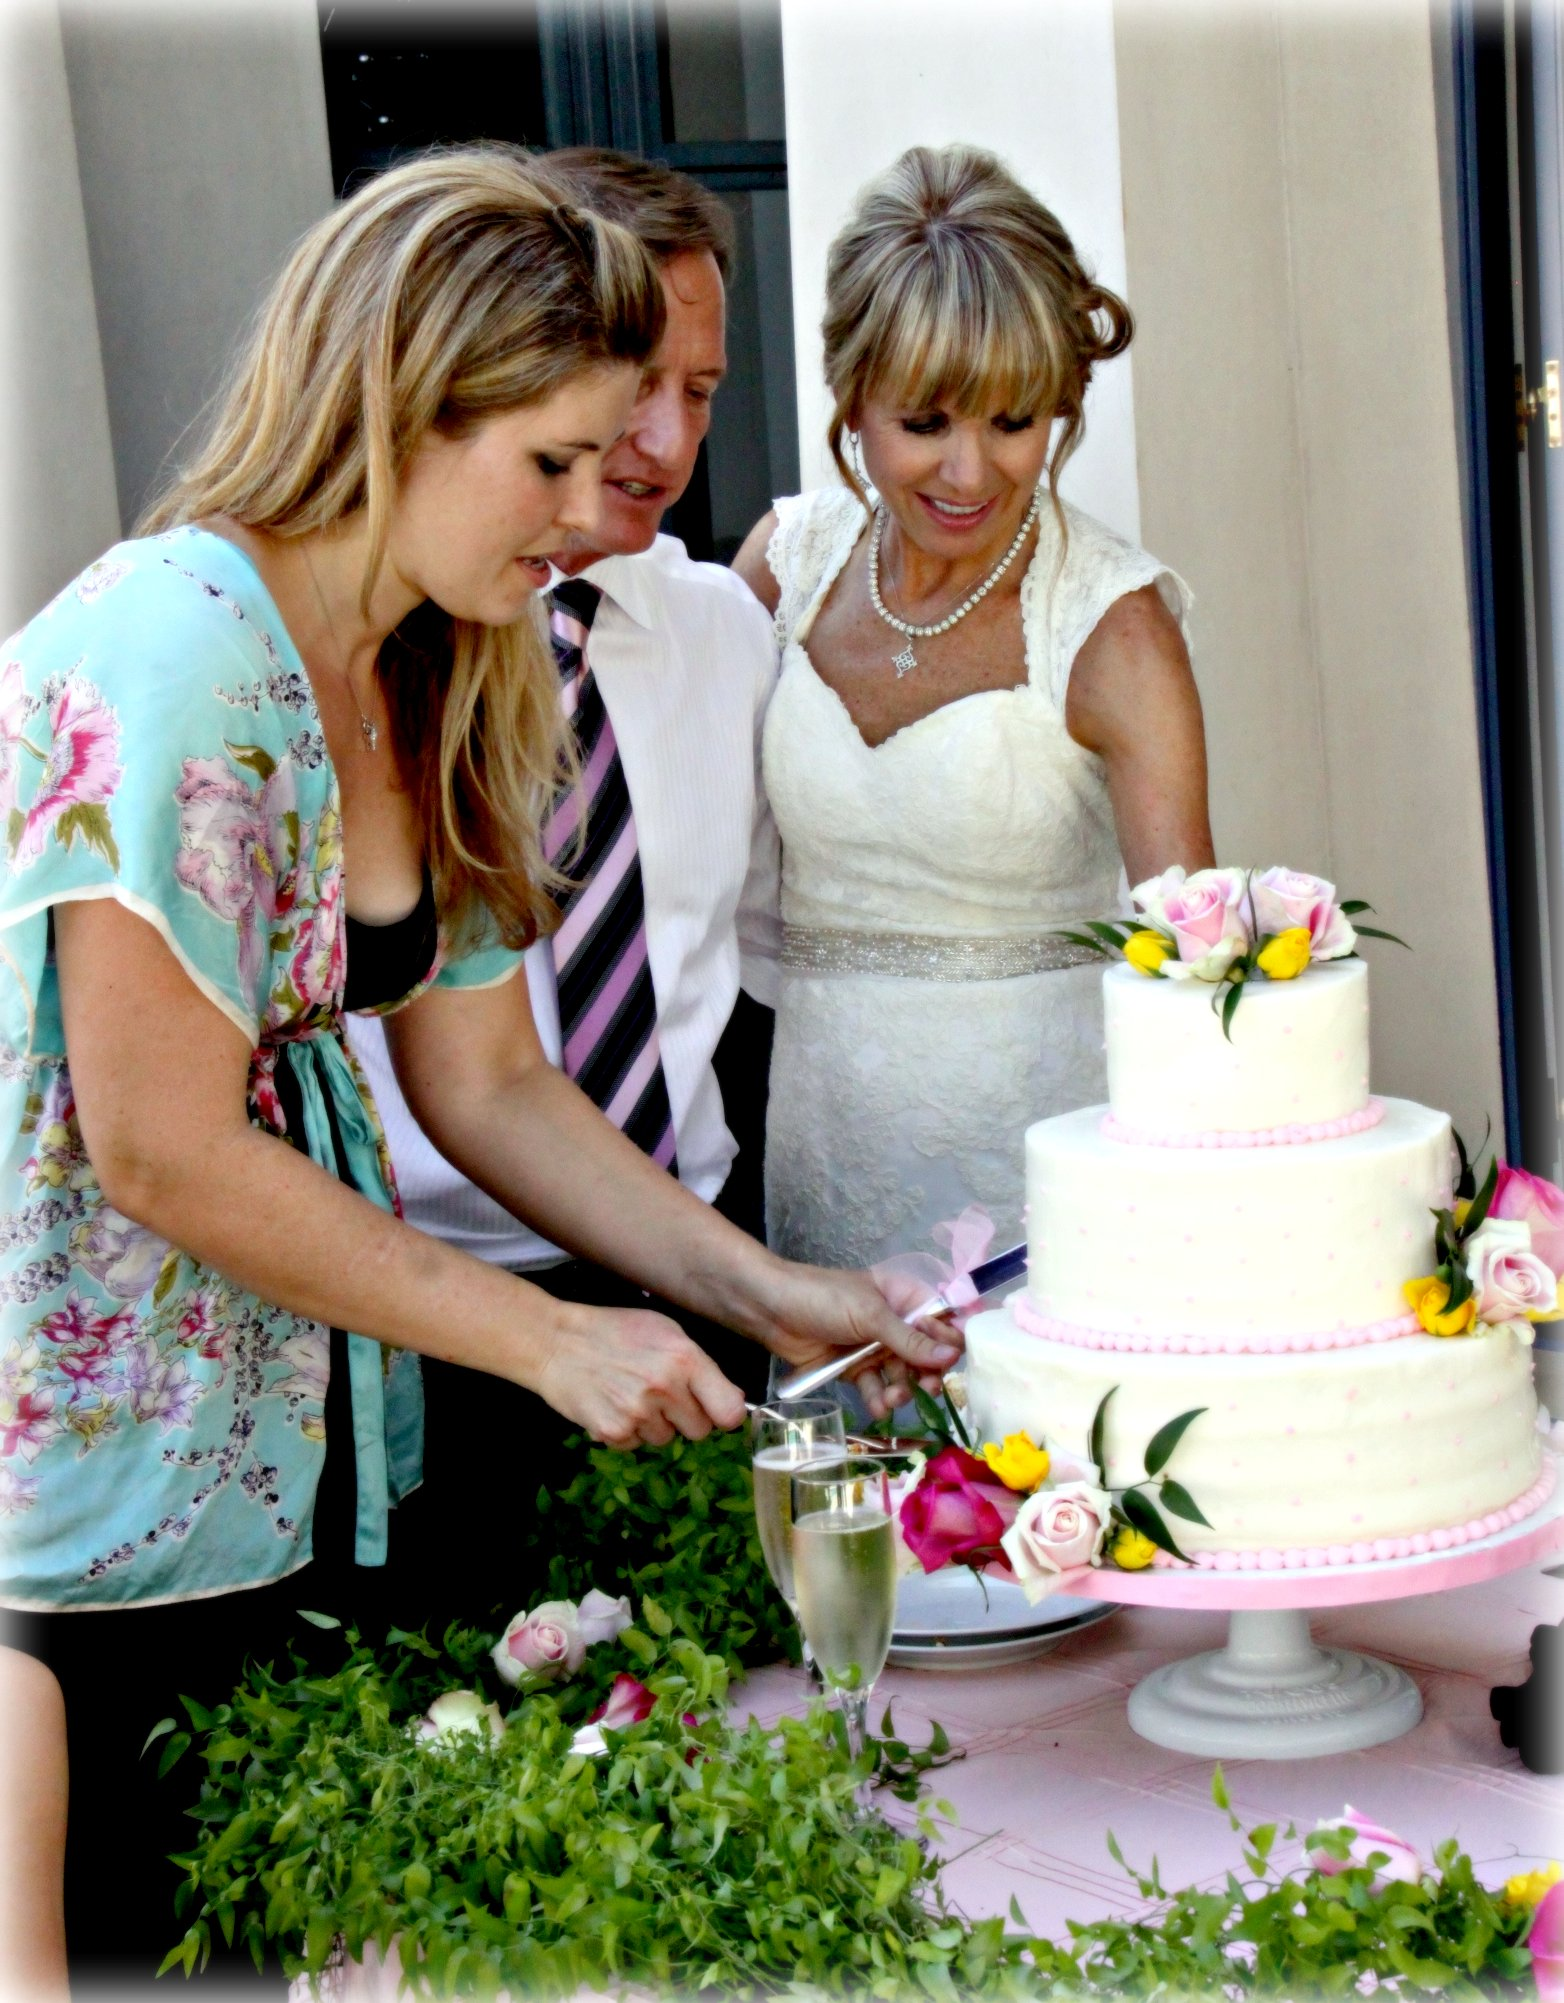 bobby and sylvia cutting cake